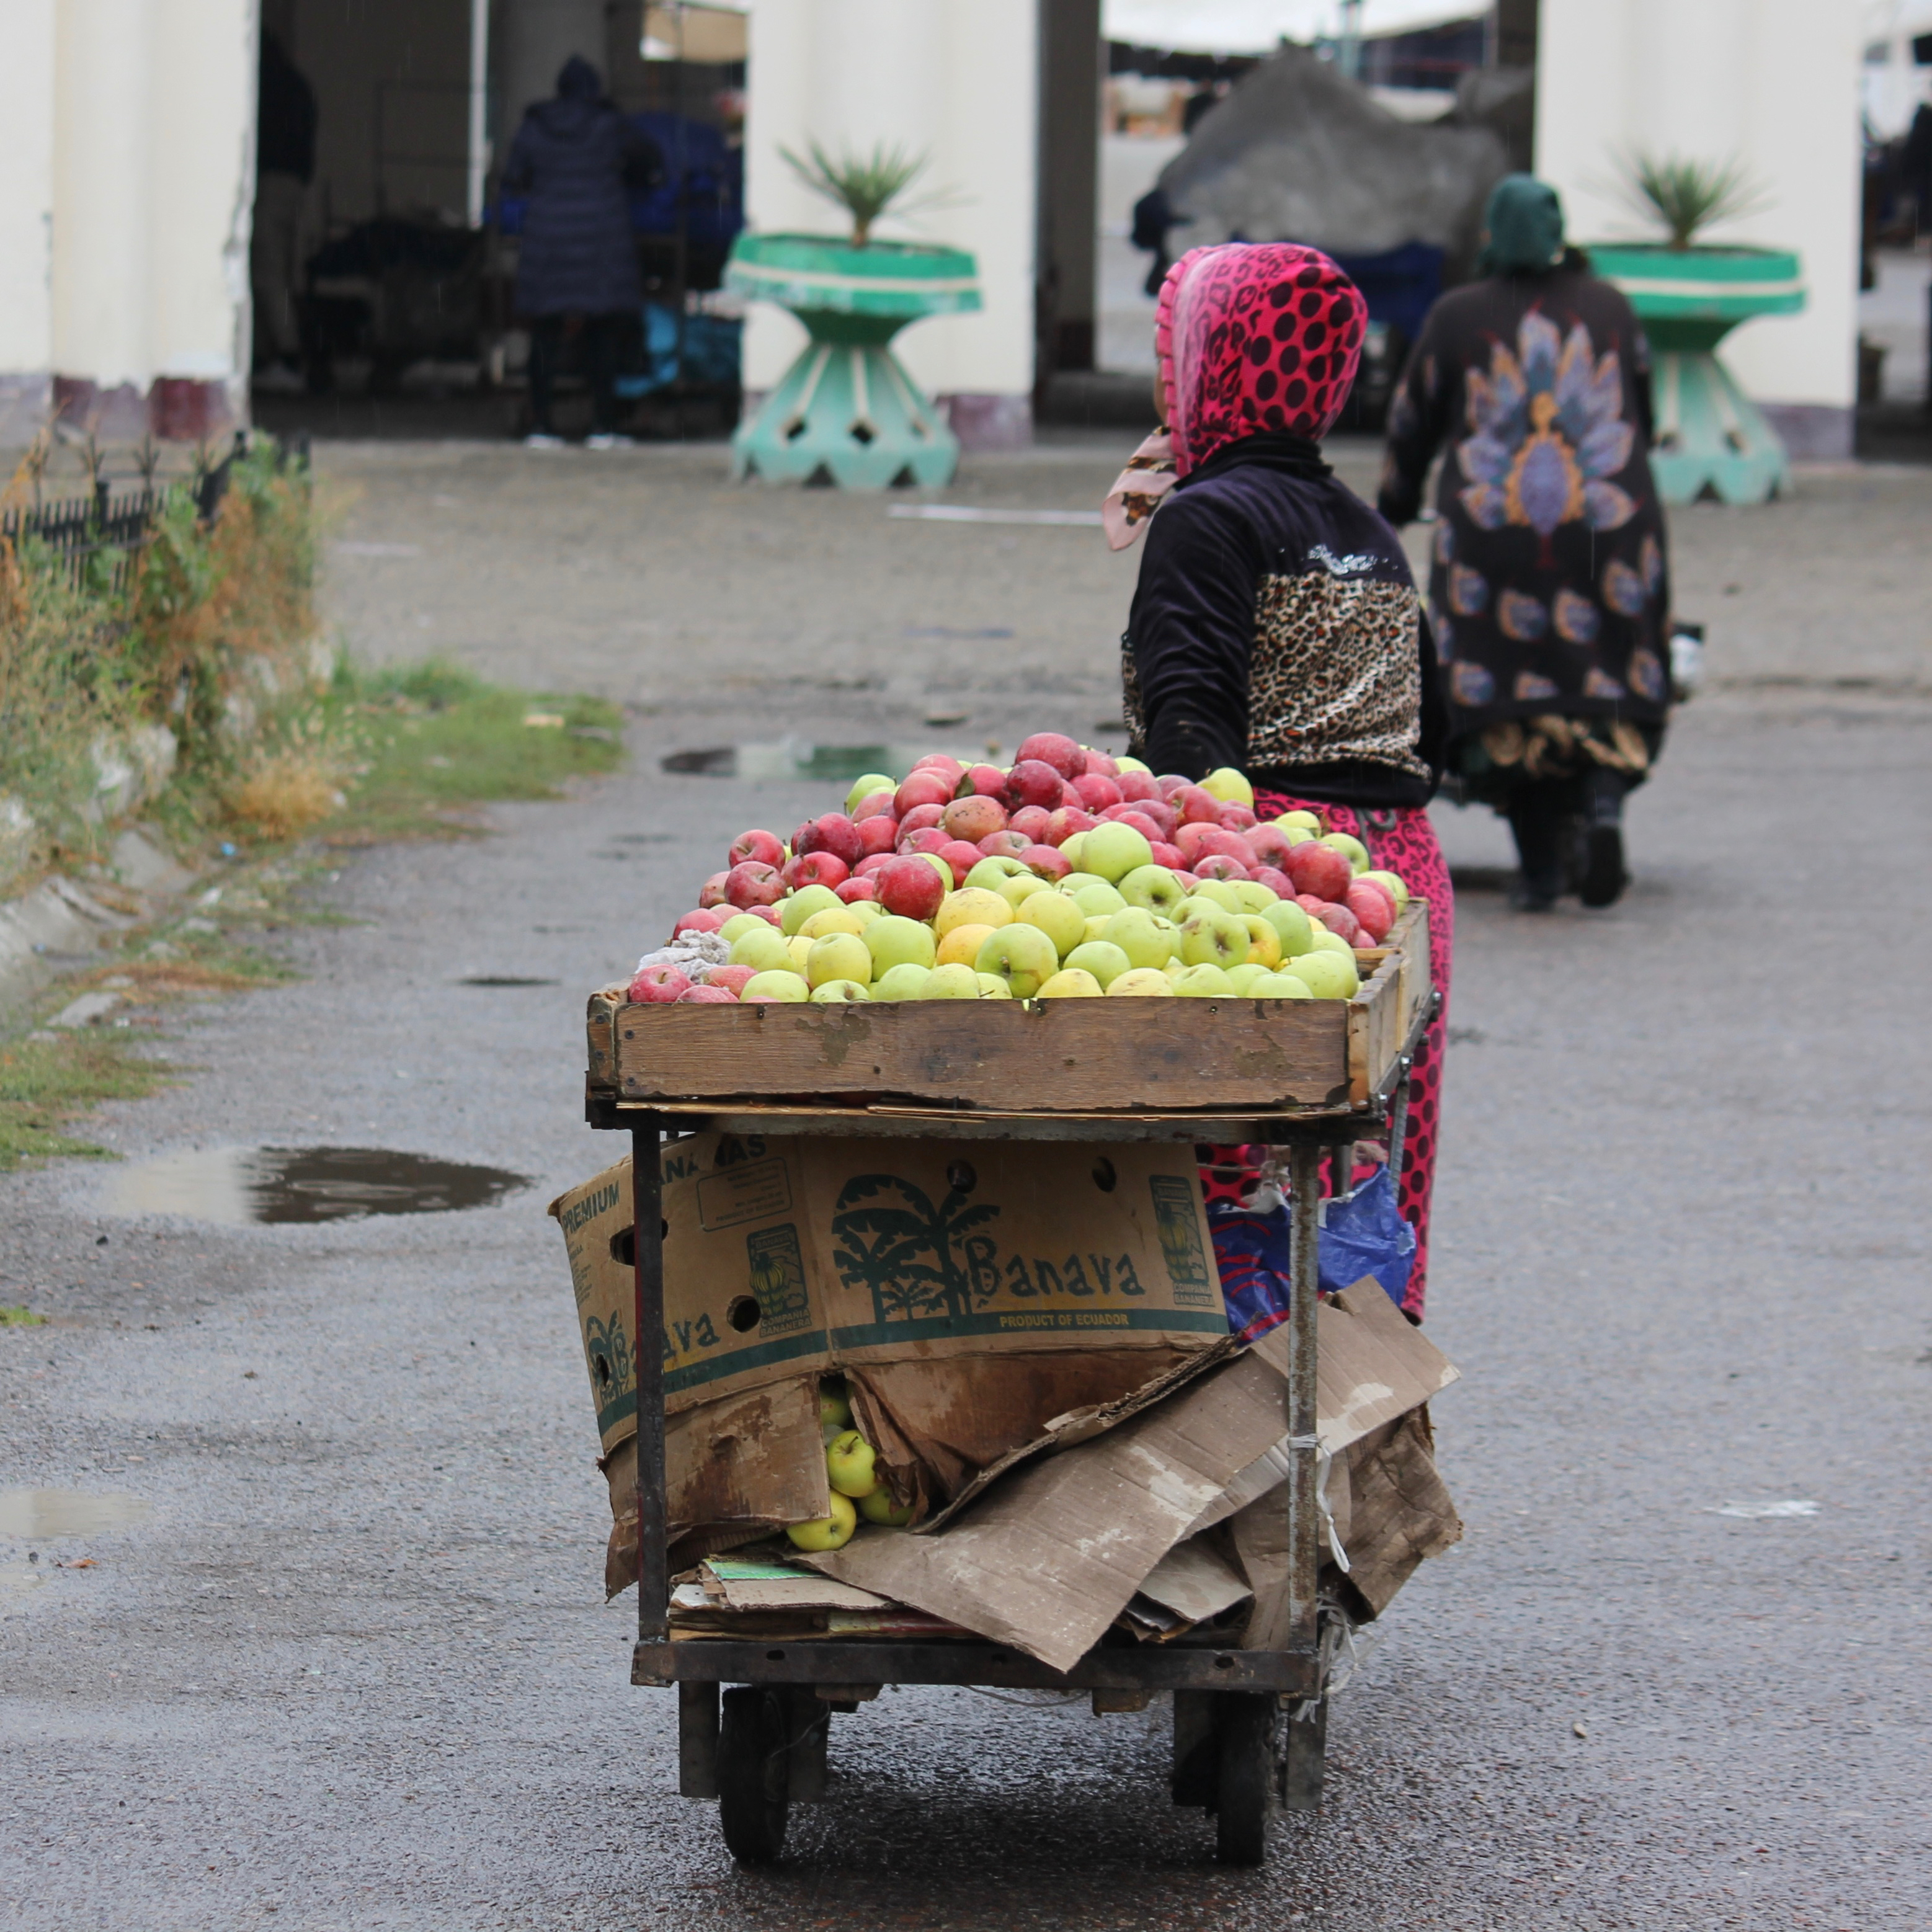 tashkent, uzbekistan - 8